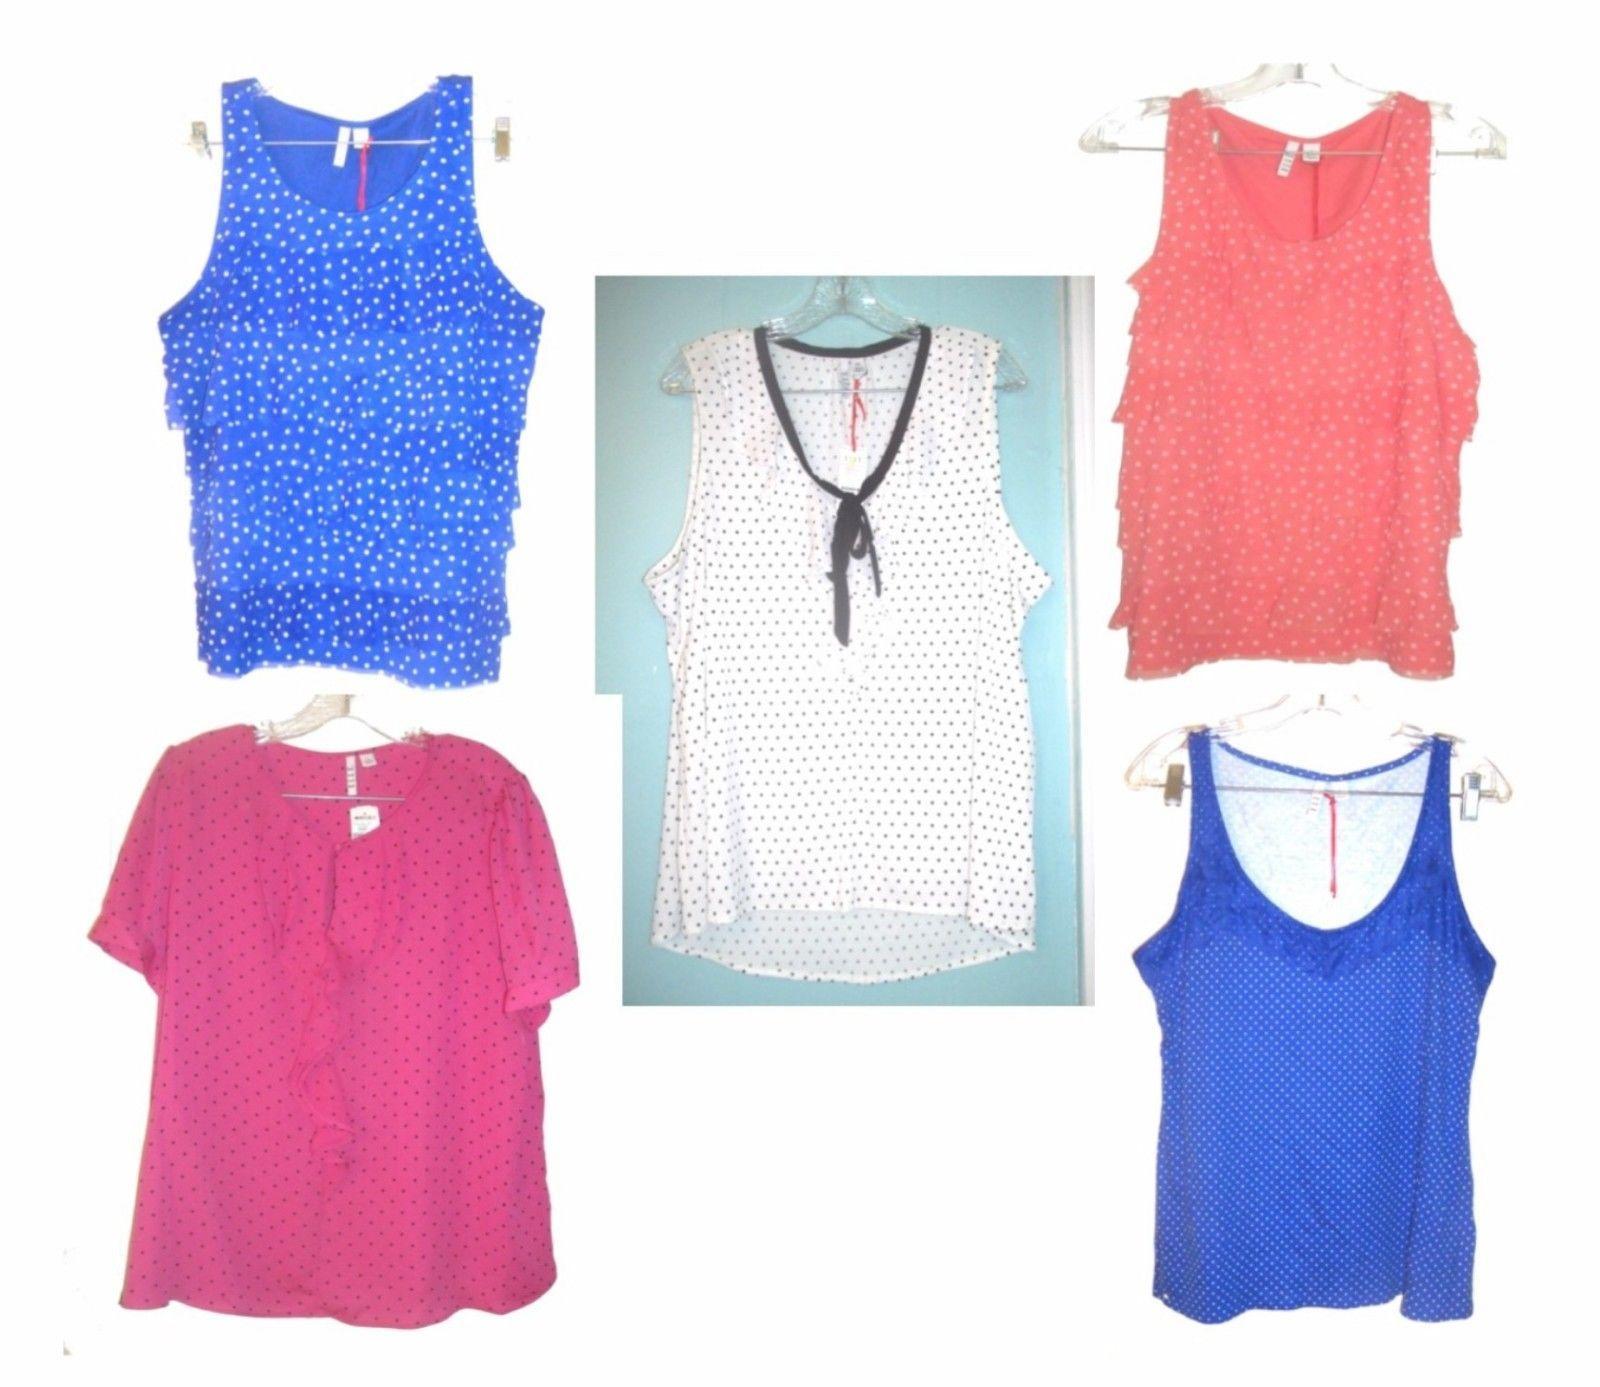 Elle Layered Chiffon & Lace & Ruffle Neck Polka Dot Tops NWT$34-$40 Size L-XL - $22.79 - $33.24